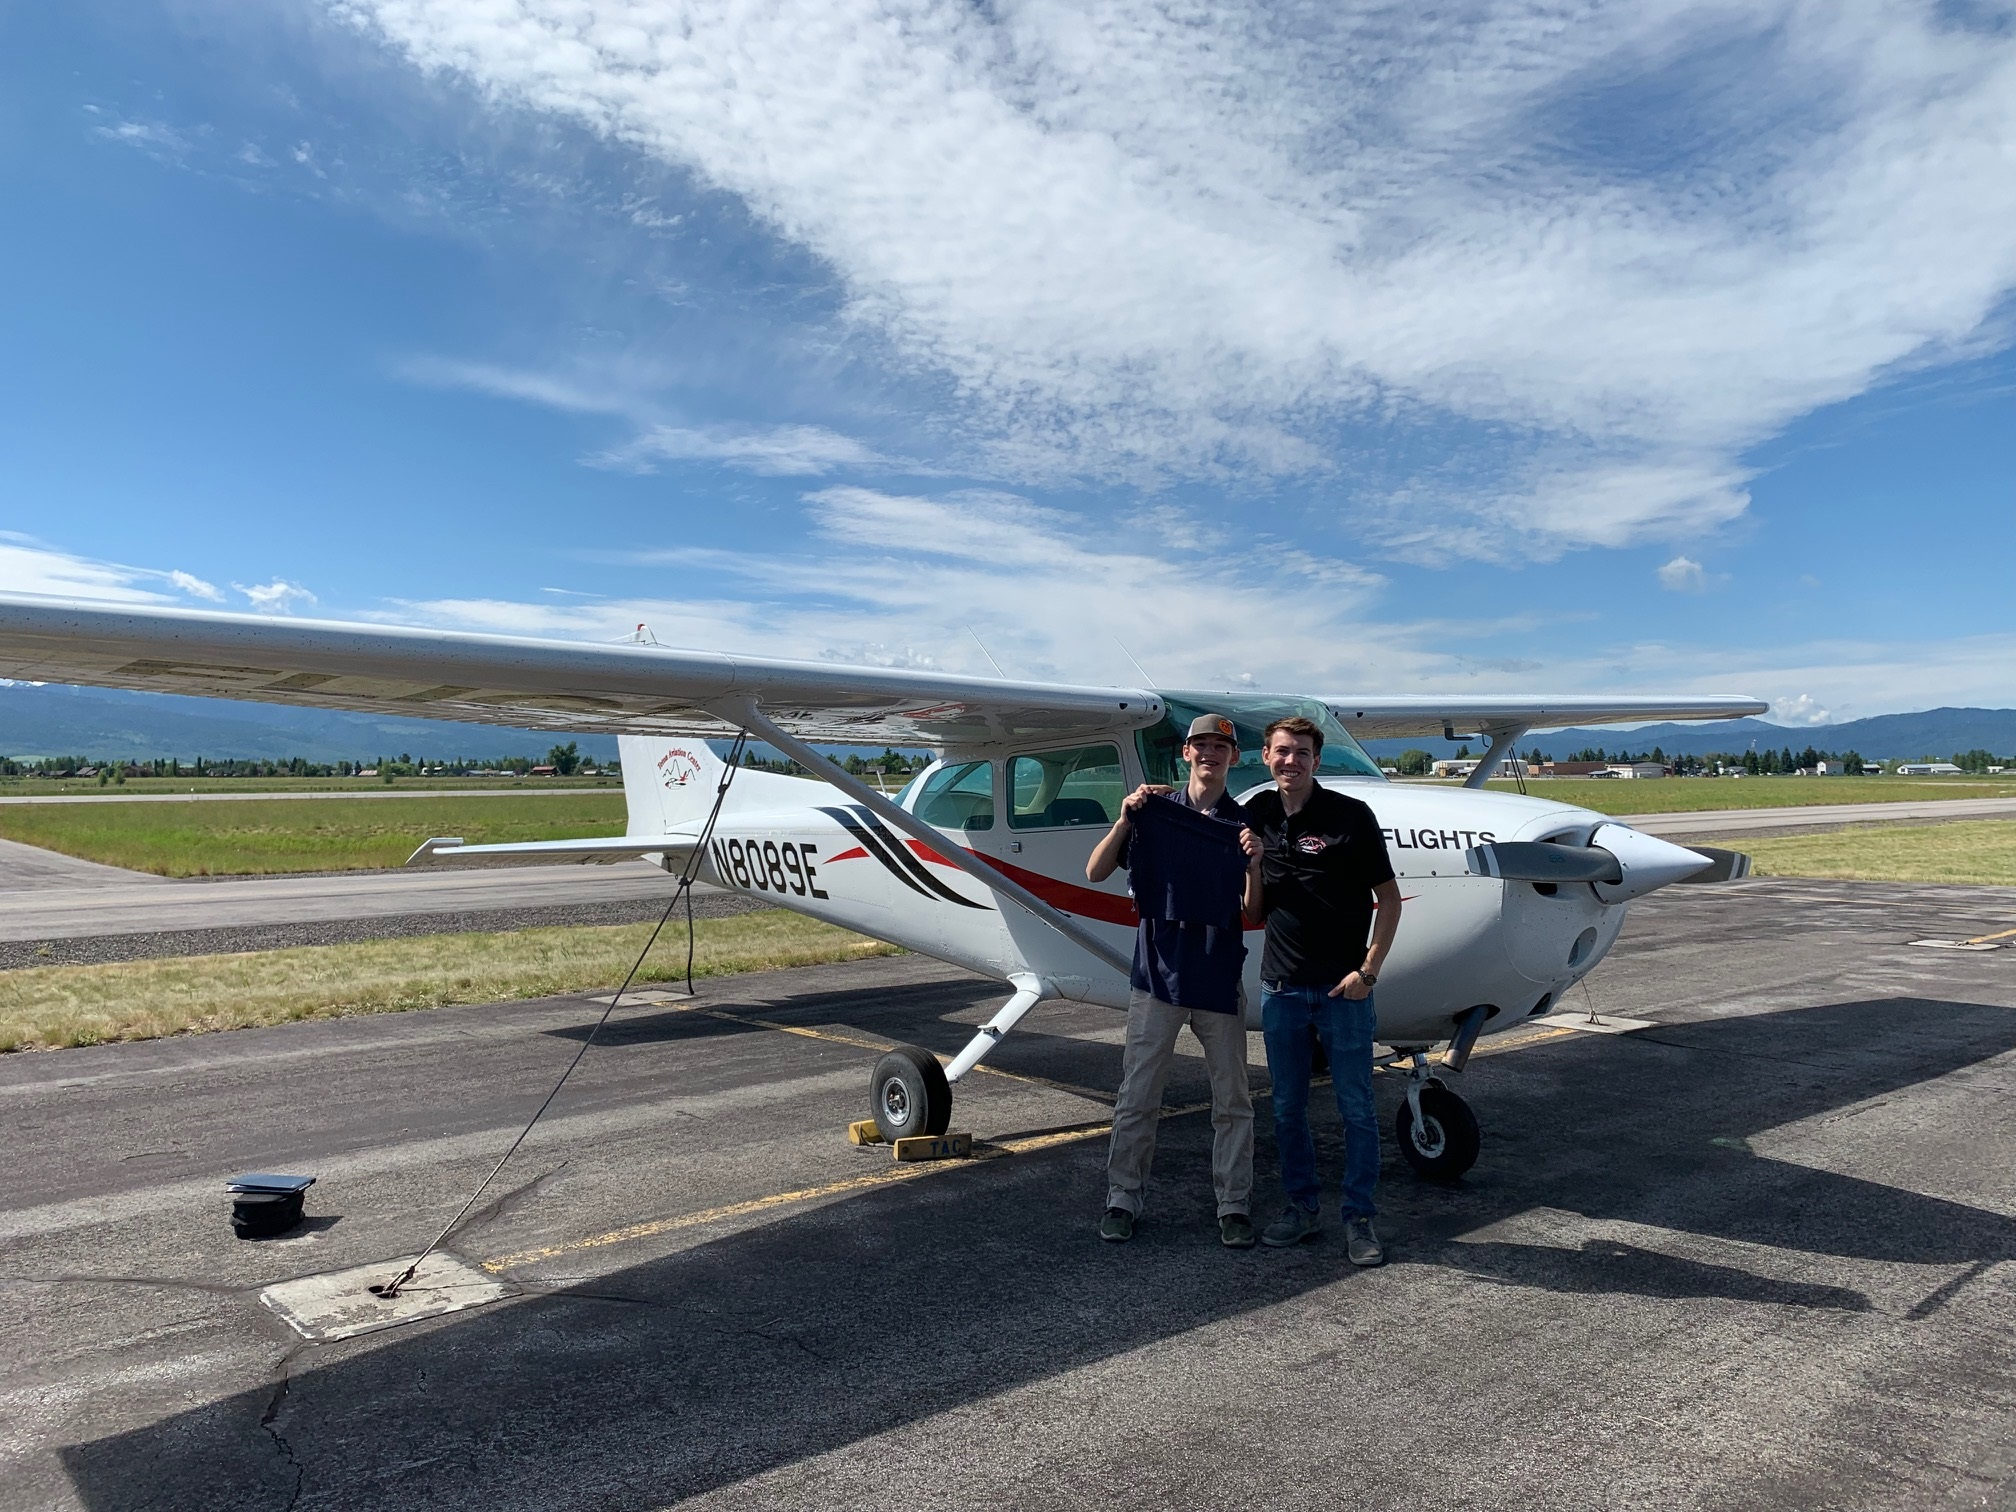 First Solo! - Owen Heaton, winner of the EAA flight scholarship soloed on July 4th 2019!Isaac Slepian CFI